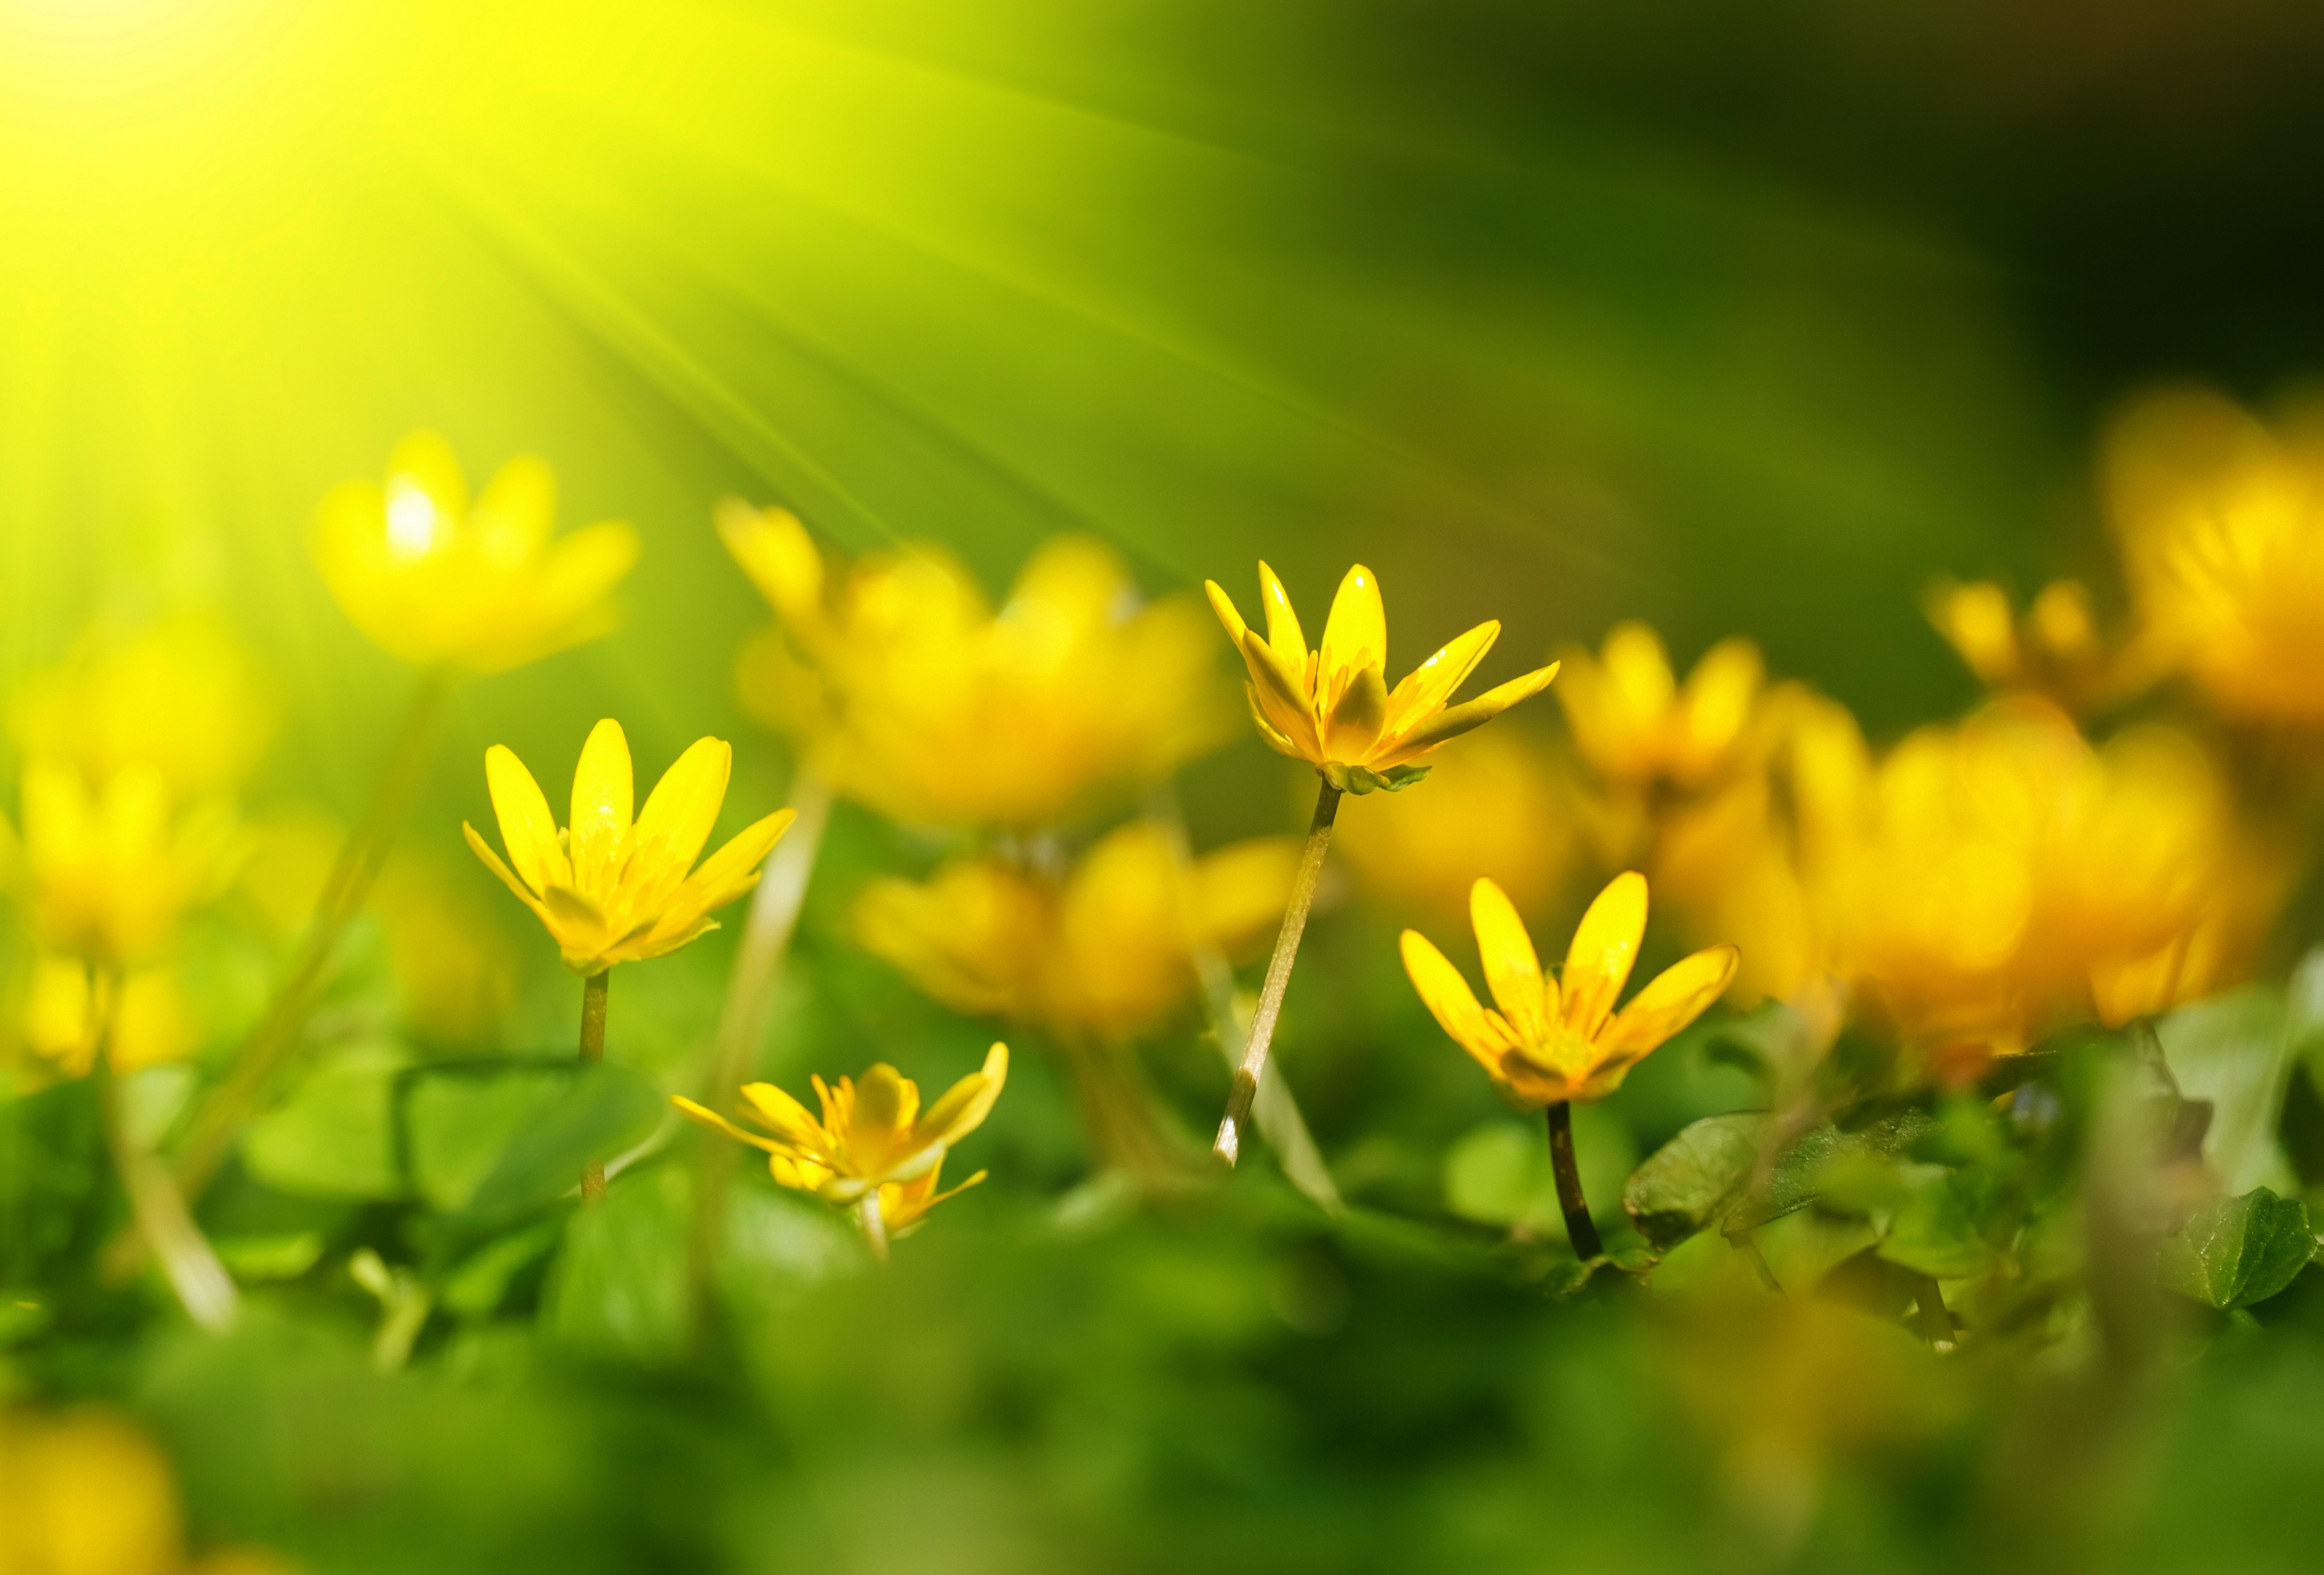 wallpaper flowers, 5k, 4k wallpaper, 8k, sunray, yellow, green grass